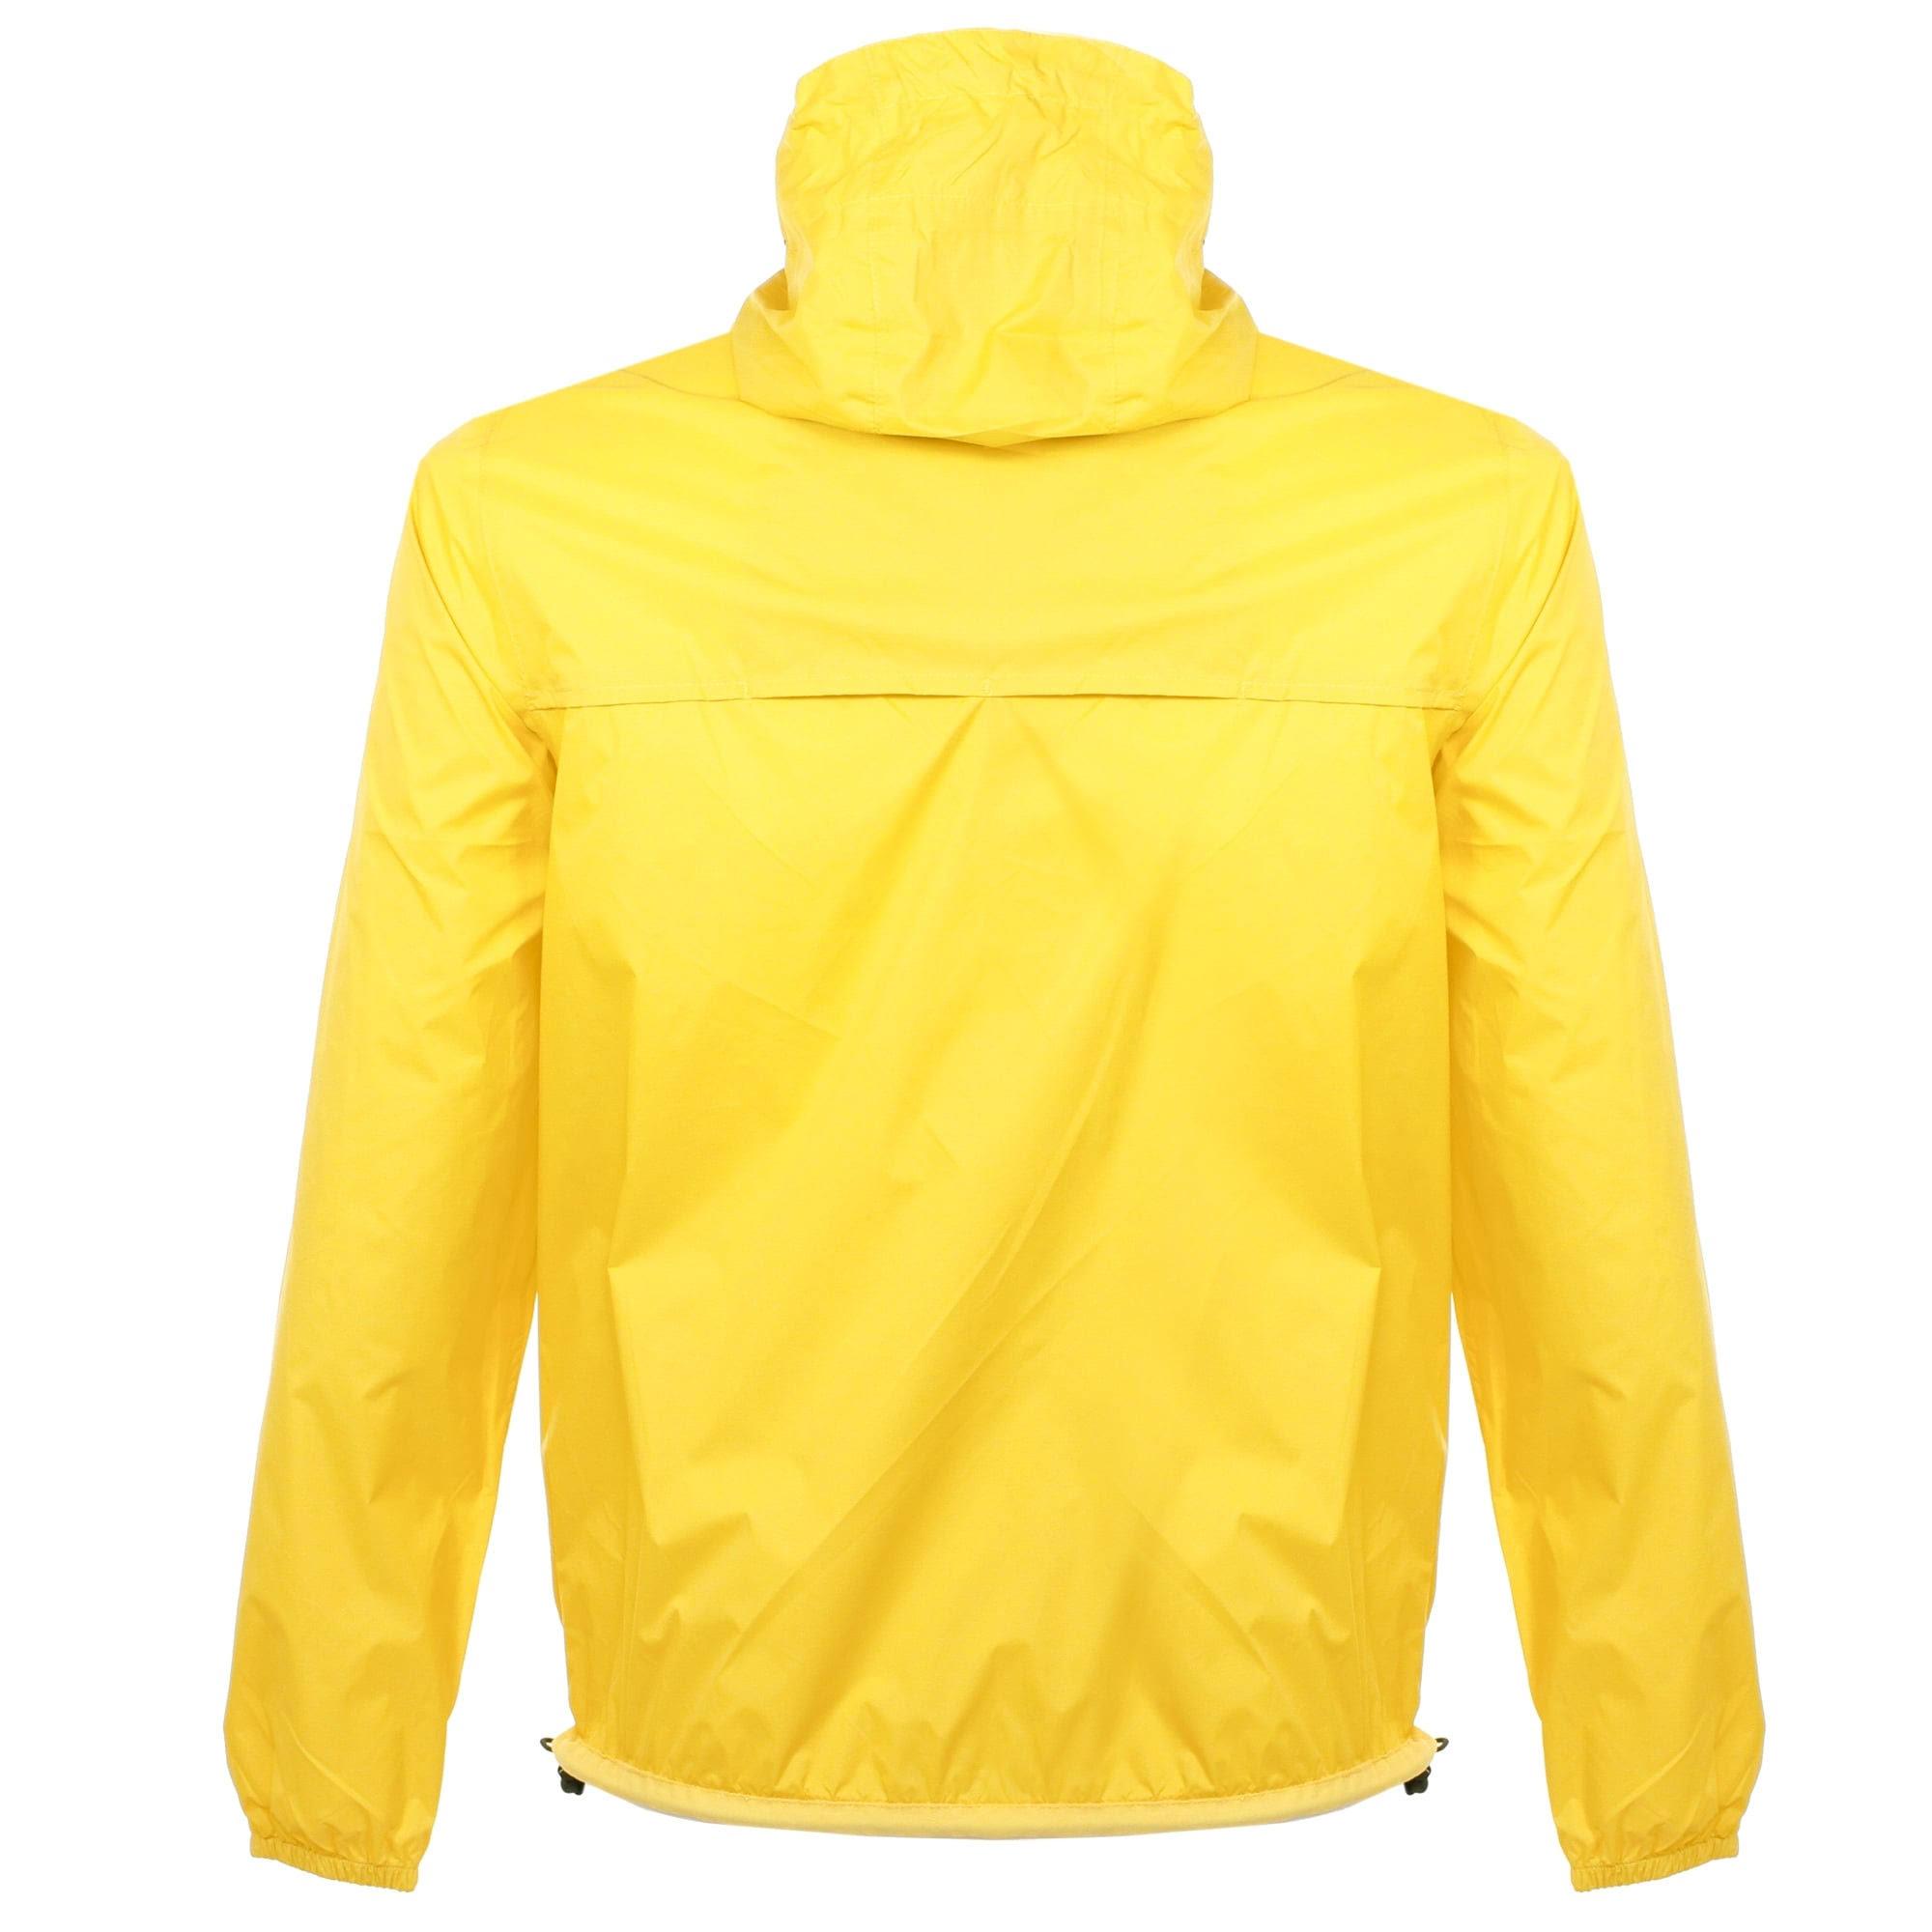 way K Claude Color Amarillo Mostaza K004bd0xcc Tamaño S A1wvBq